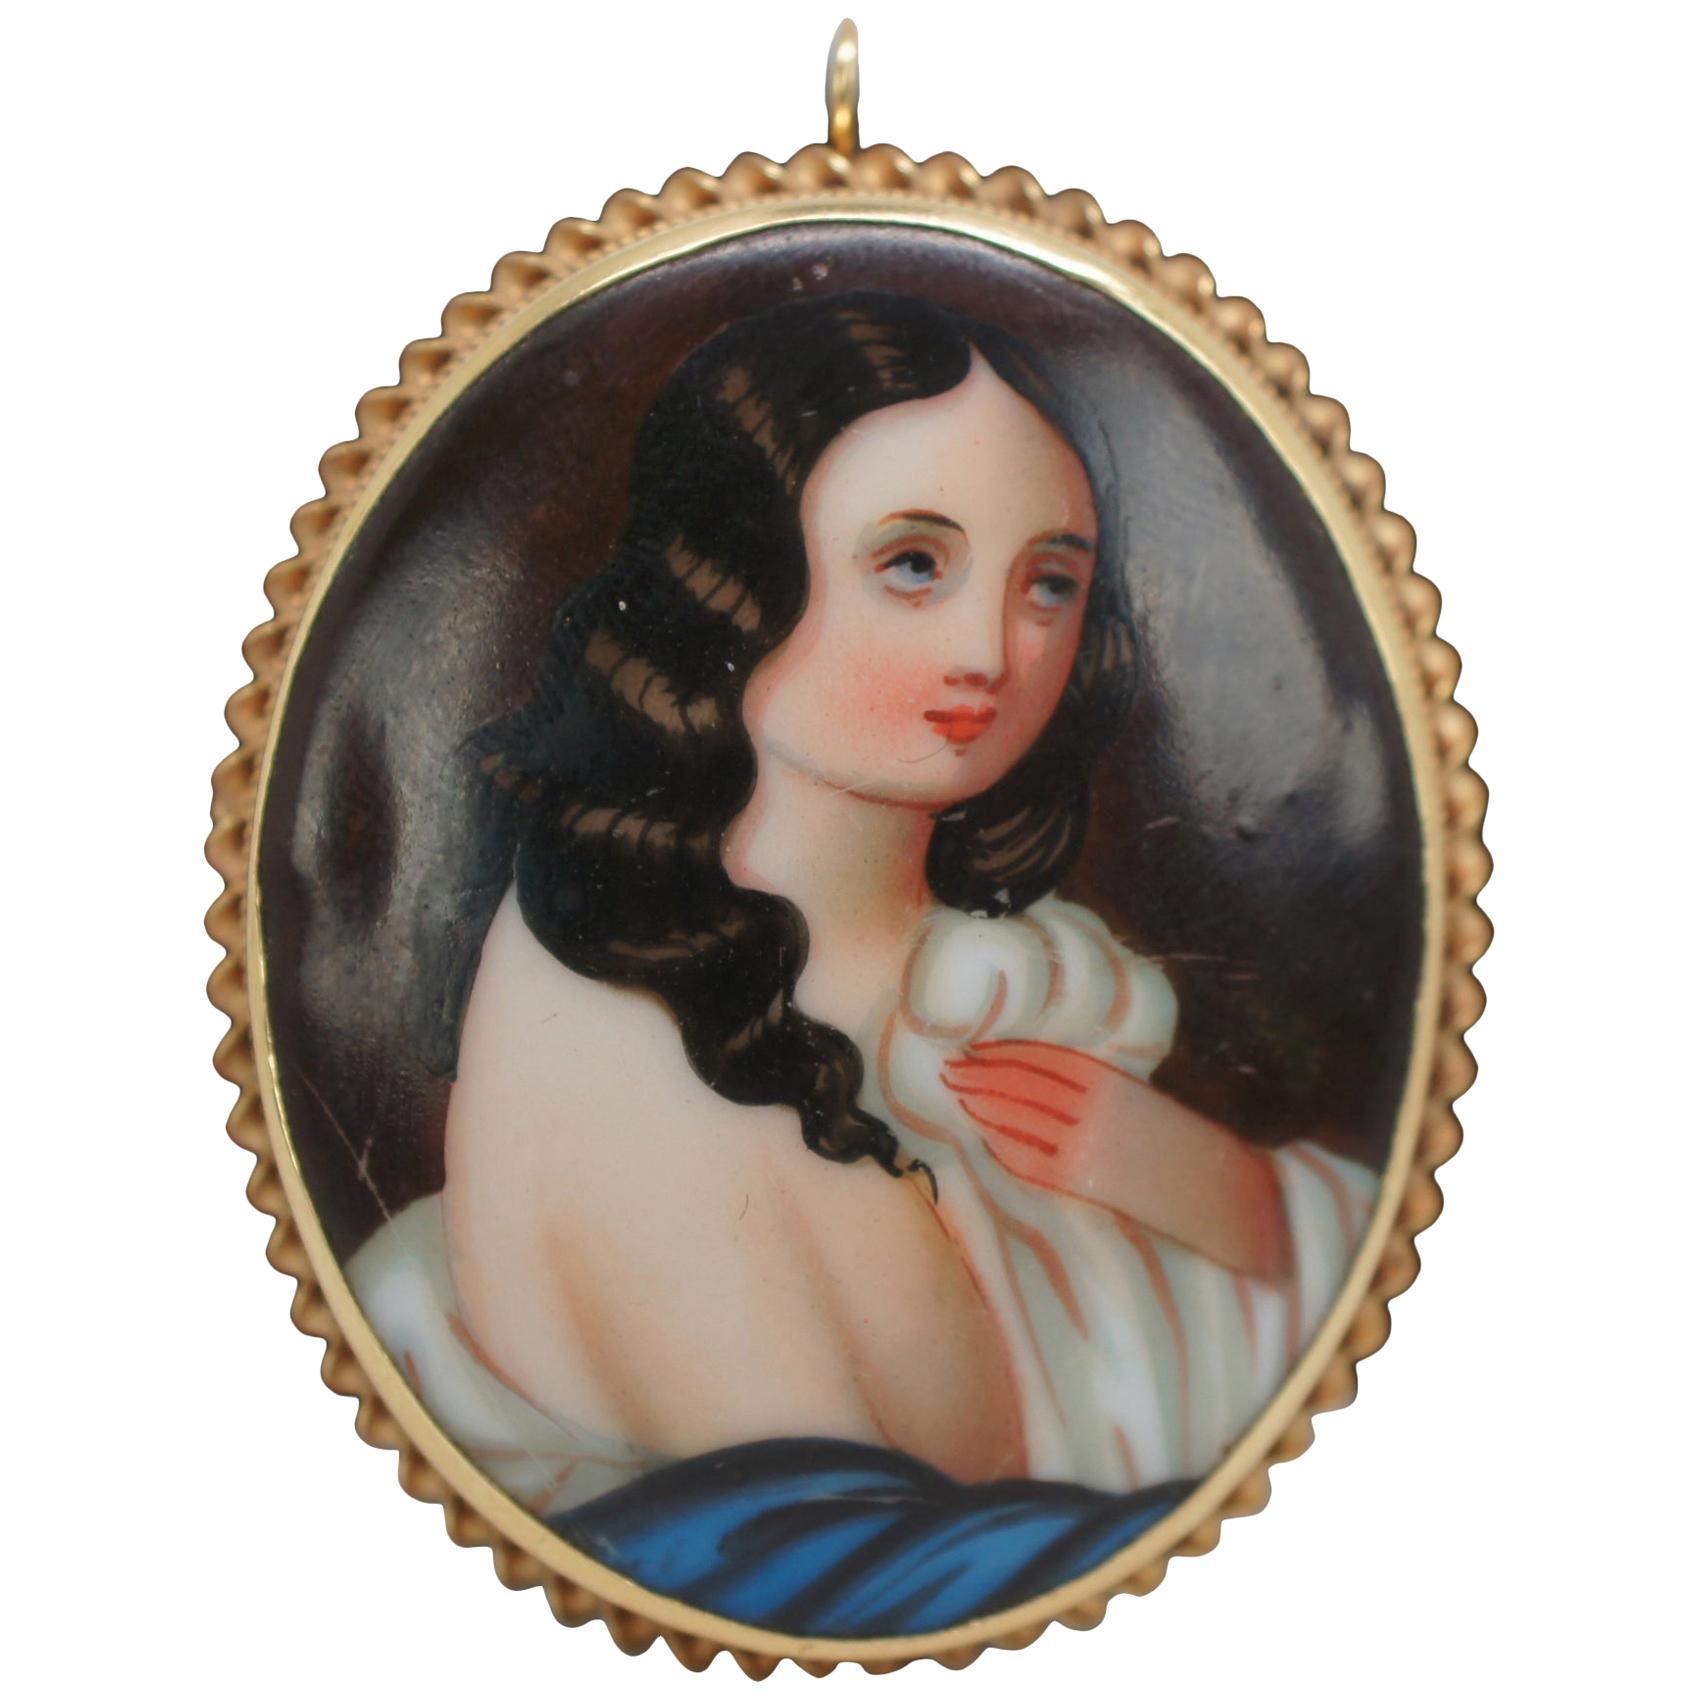 14-Karat Yellow Gold Hand Painted Porcelain Cameo Portrait Brooch Pendant